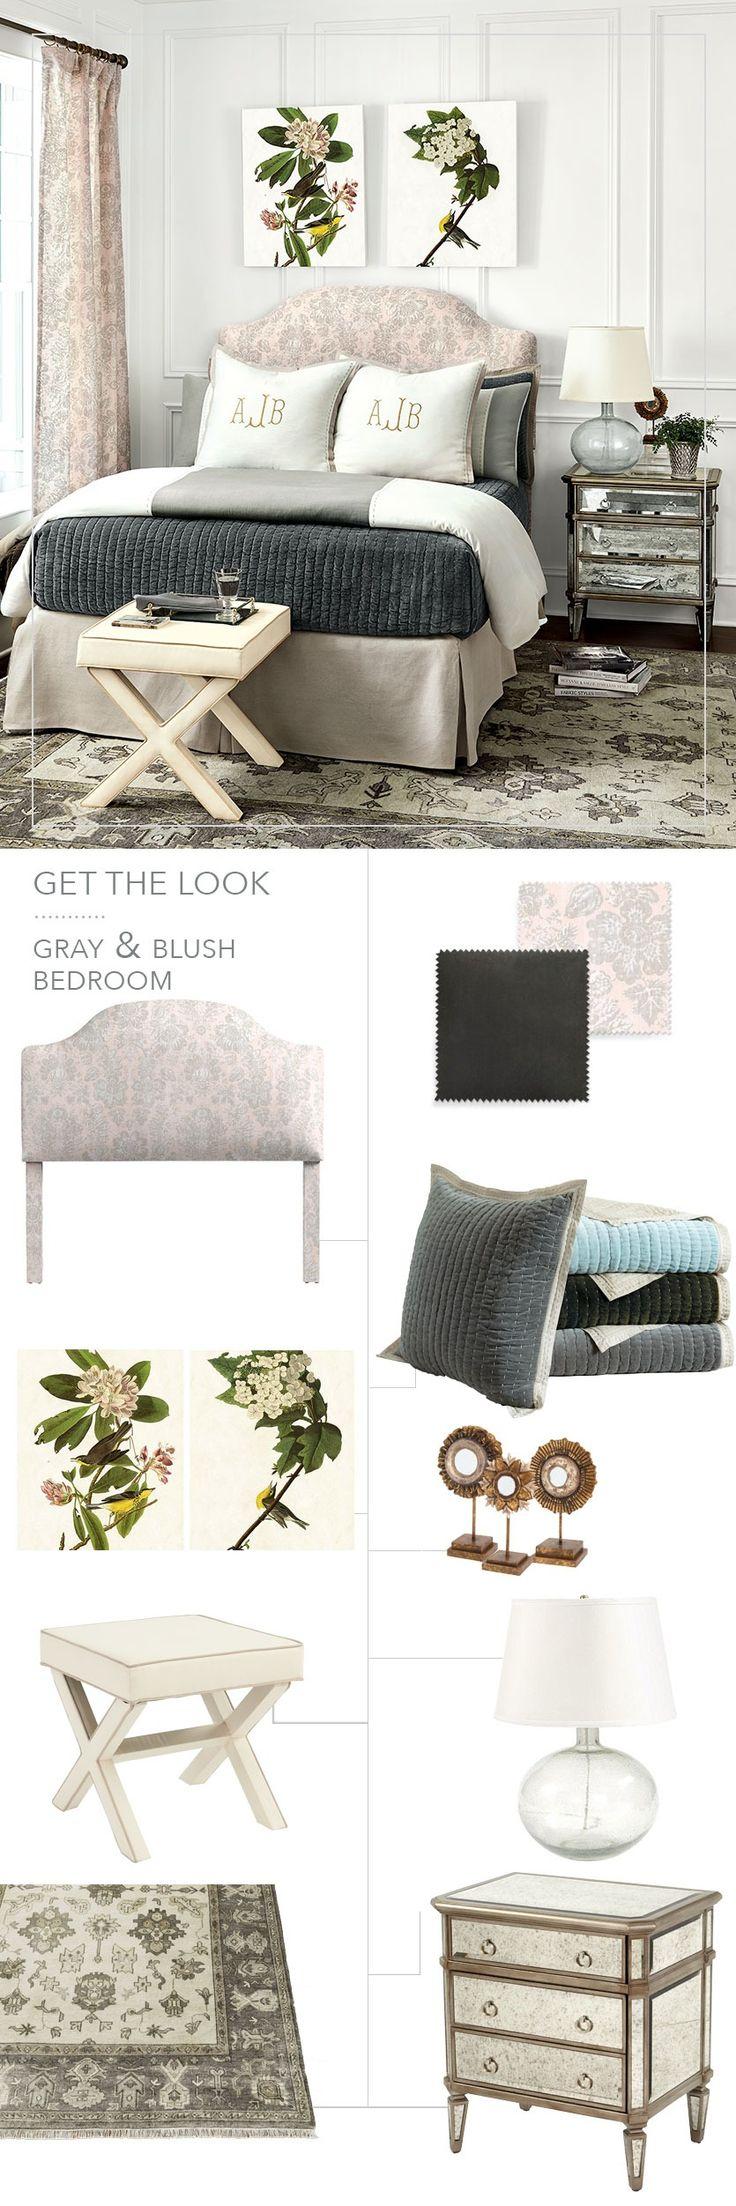 678 best bedroom images on pinterest guest bedrooms ballard blush and gray bedroom from ballard designs winter 2017 catalog